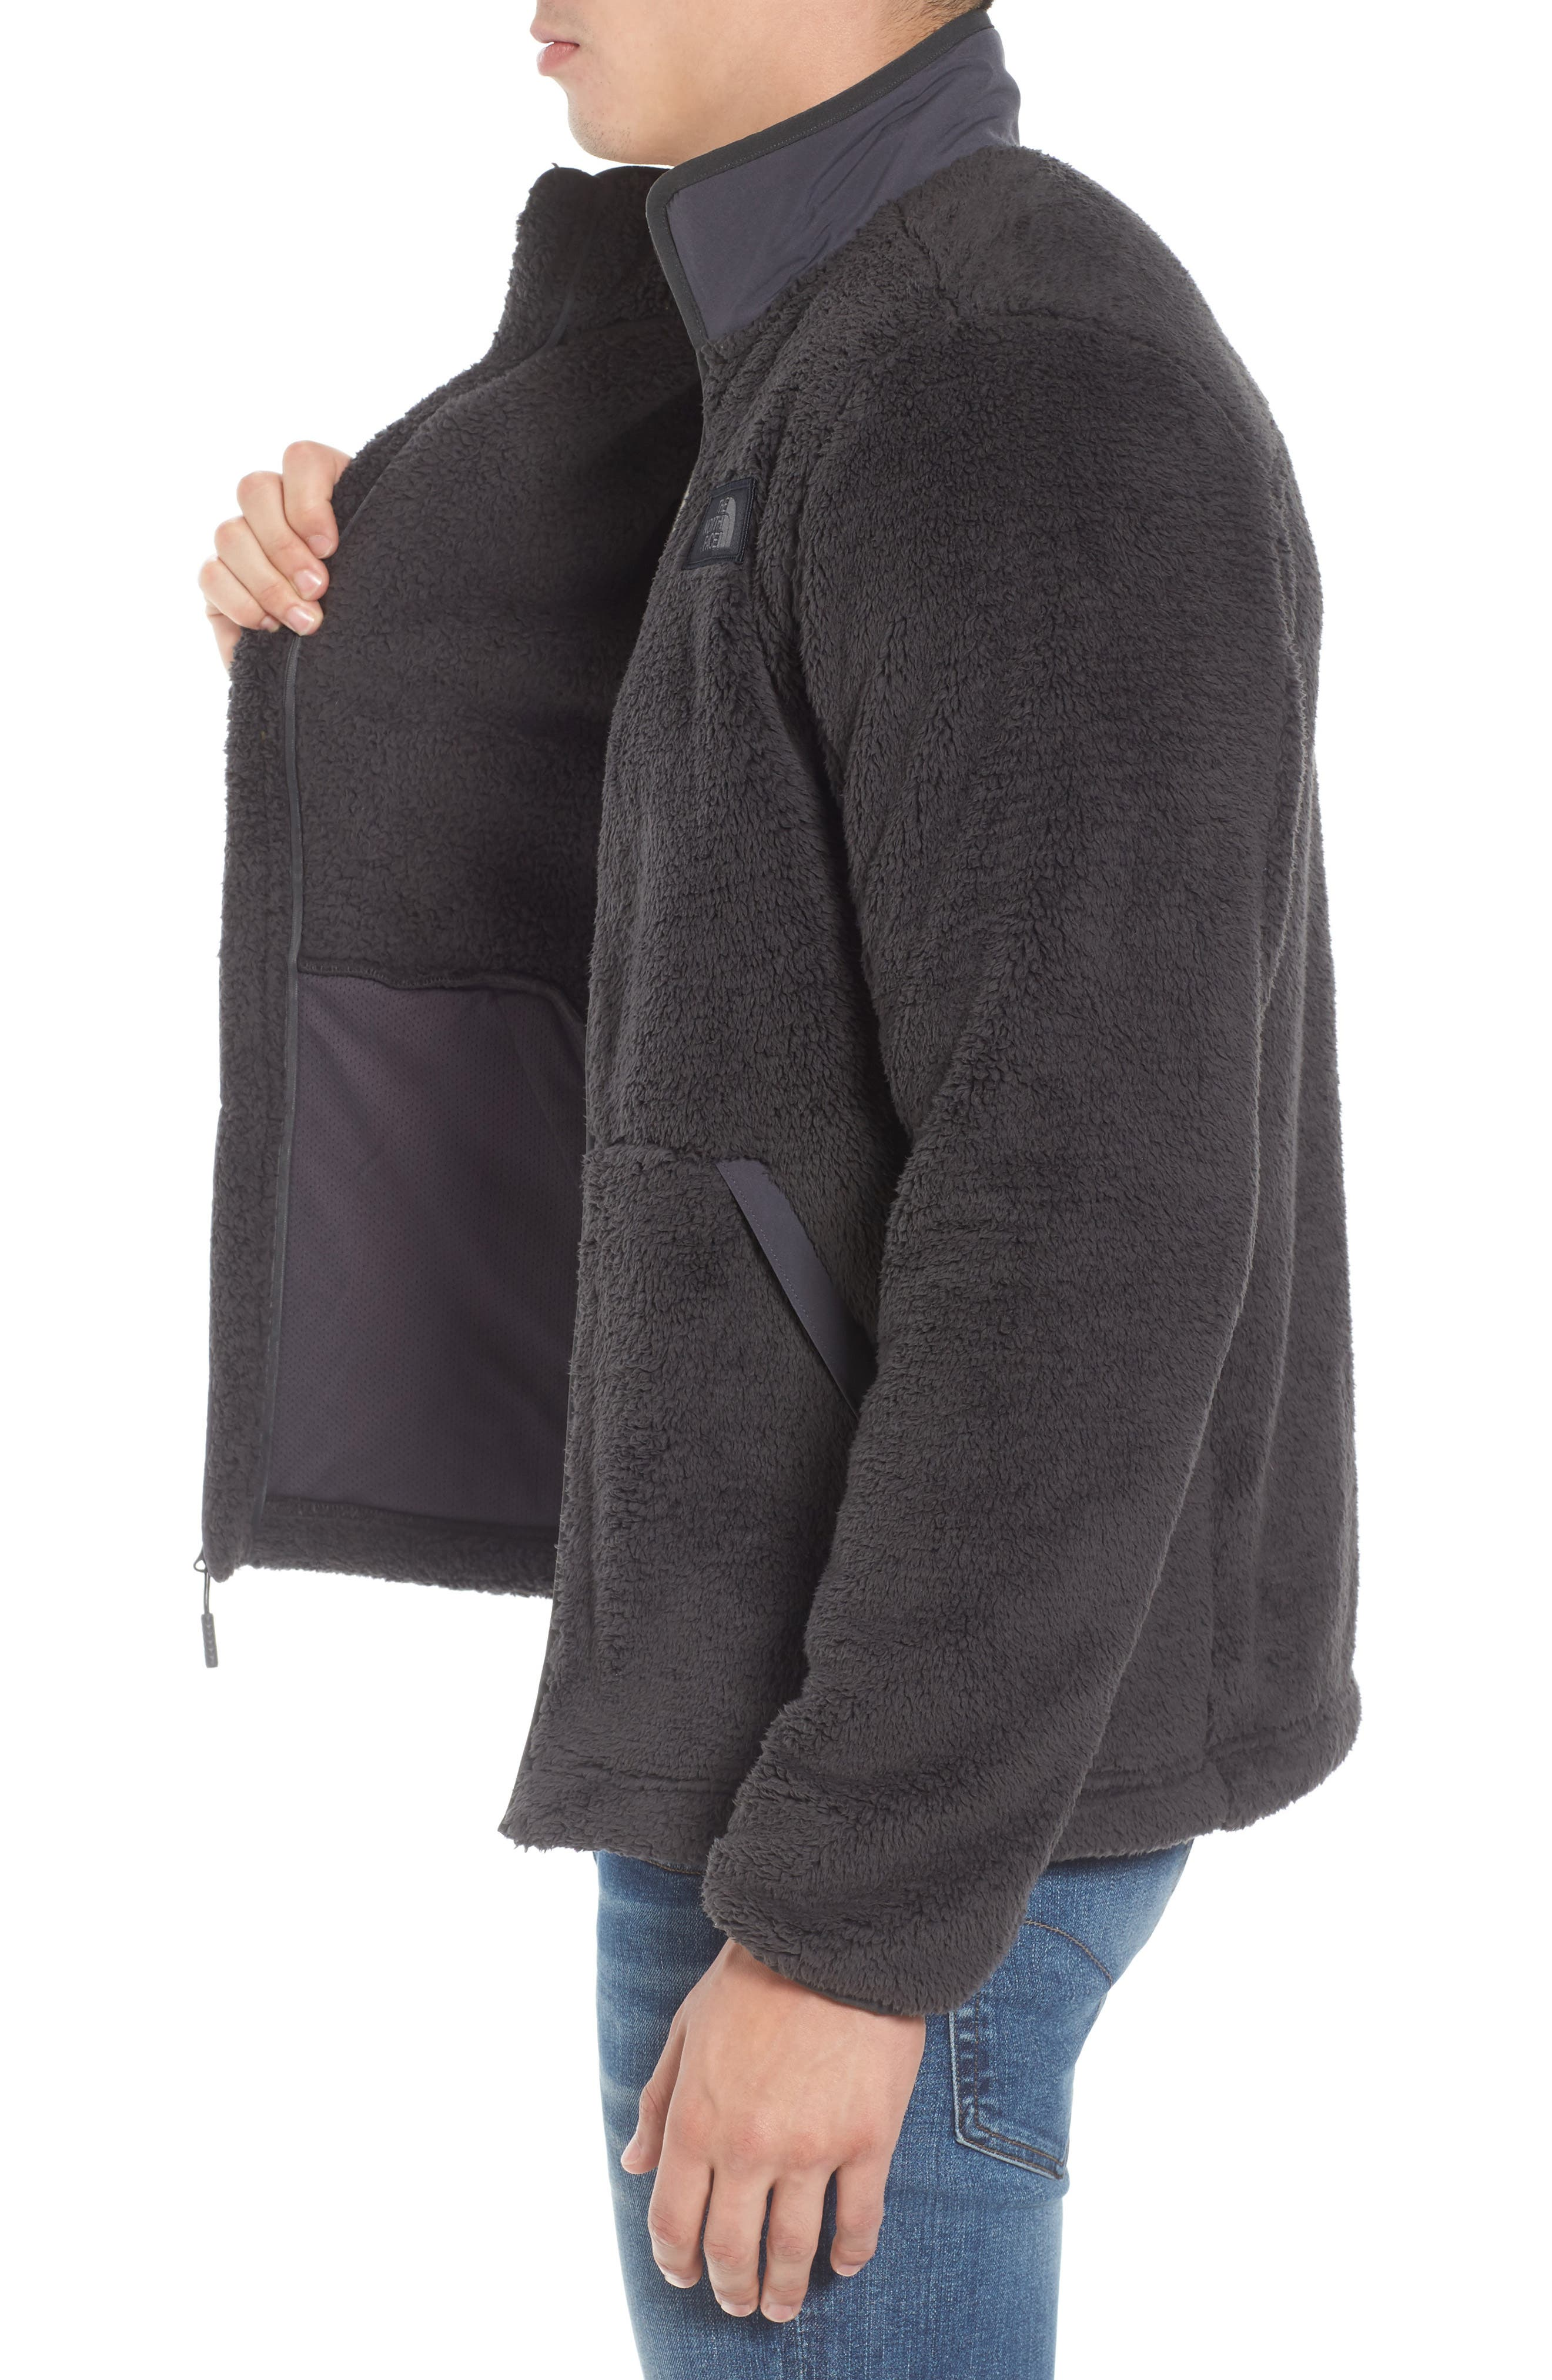 Campshire Zip Fleece Jacket,                             Alternate thumbnail 23, color,